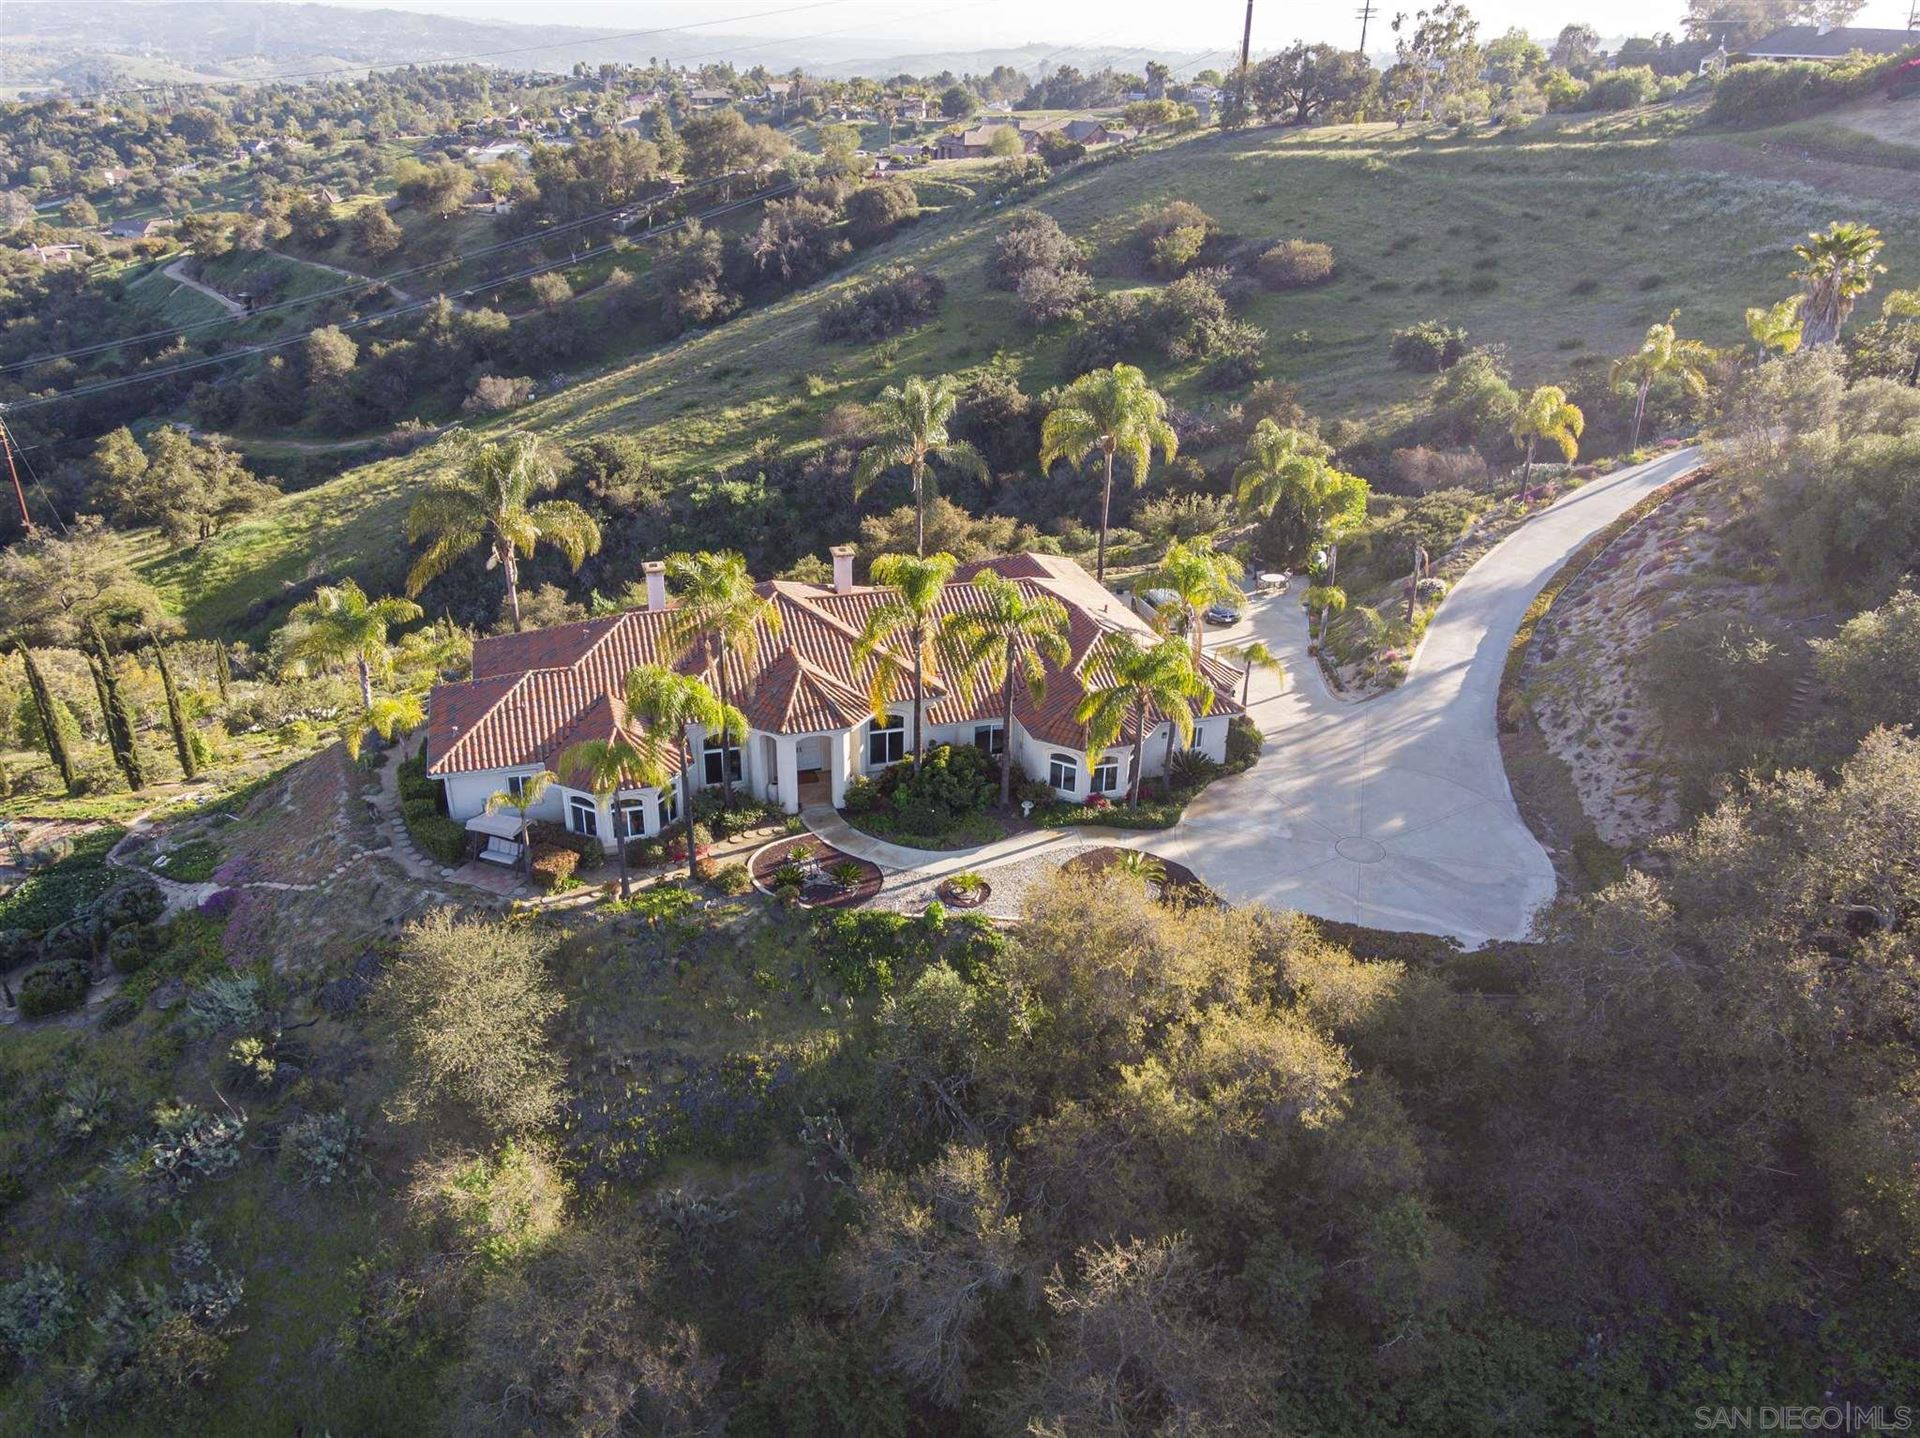 Photo of 2332 Vista Valle Verde Dr, Fallbrook, CA 92028 (MLS # 210008267)